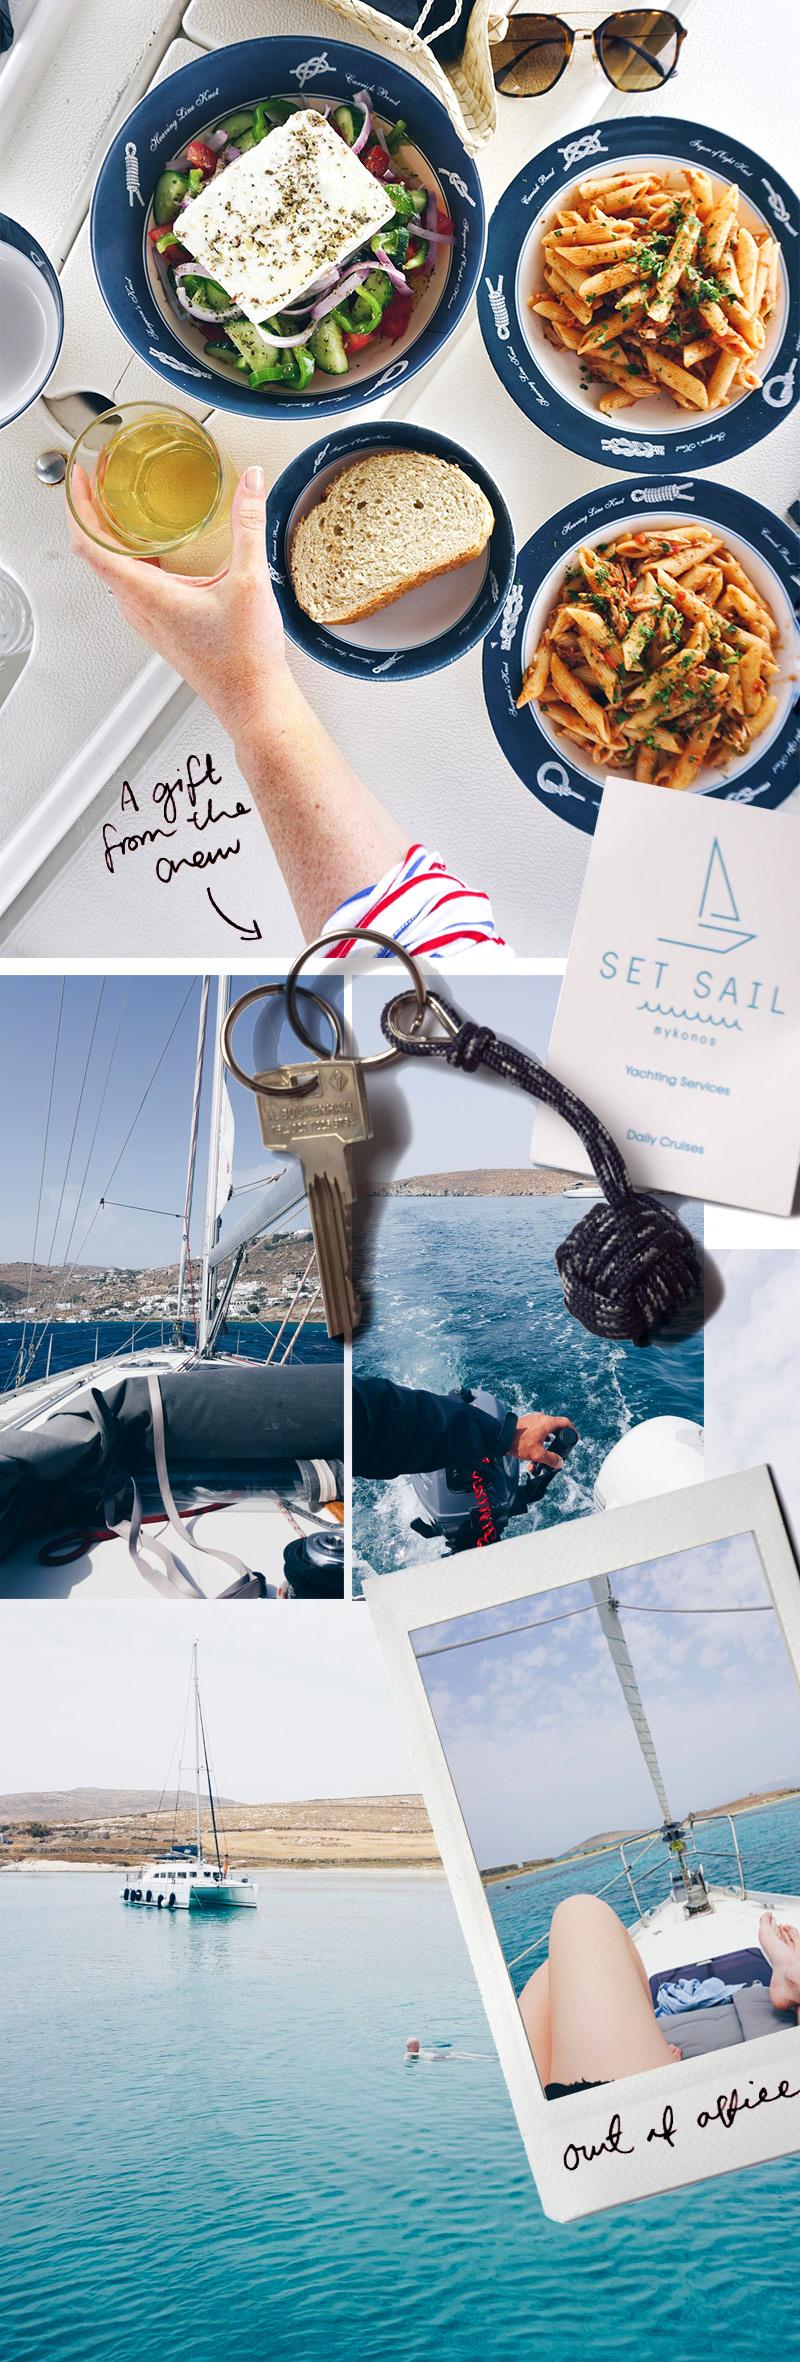 Our Boat tour around Mykonos